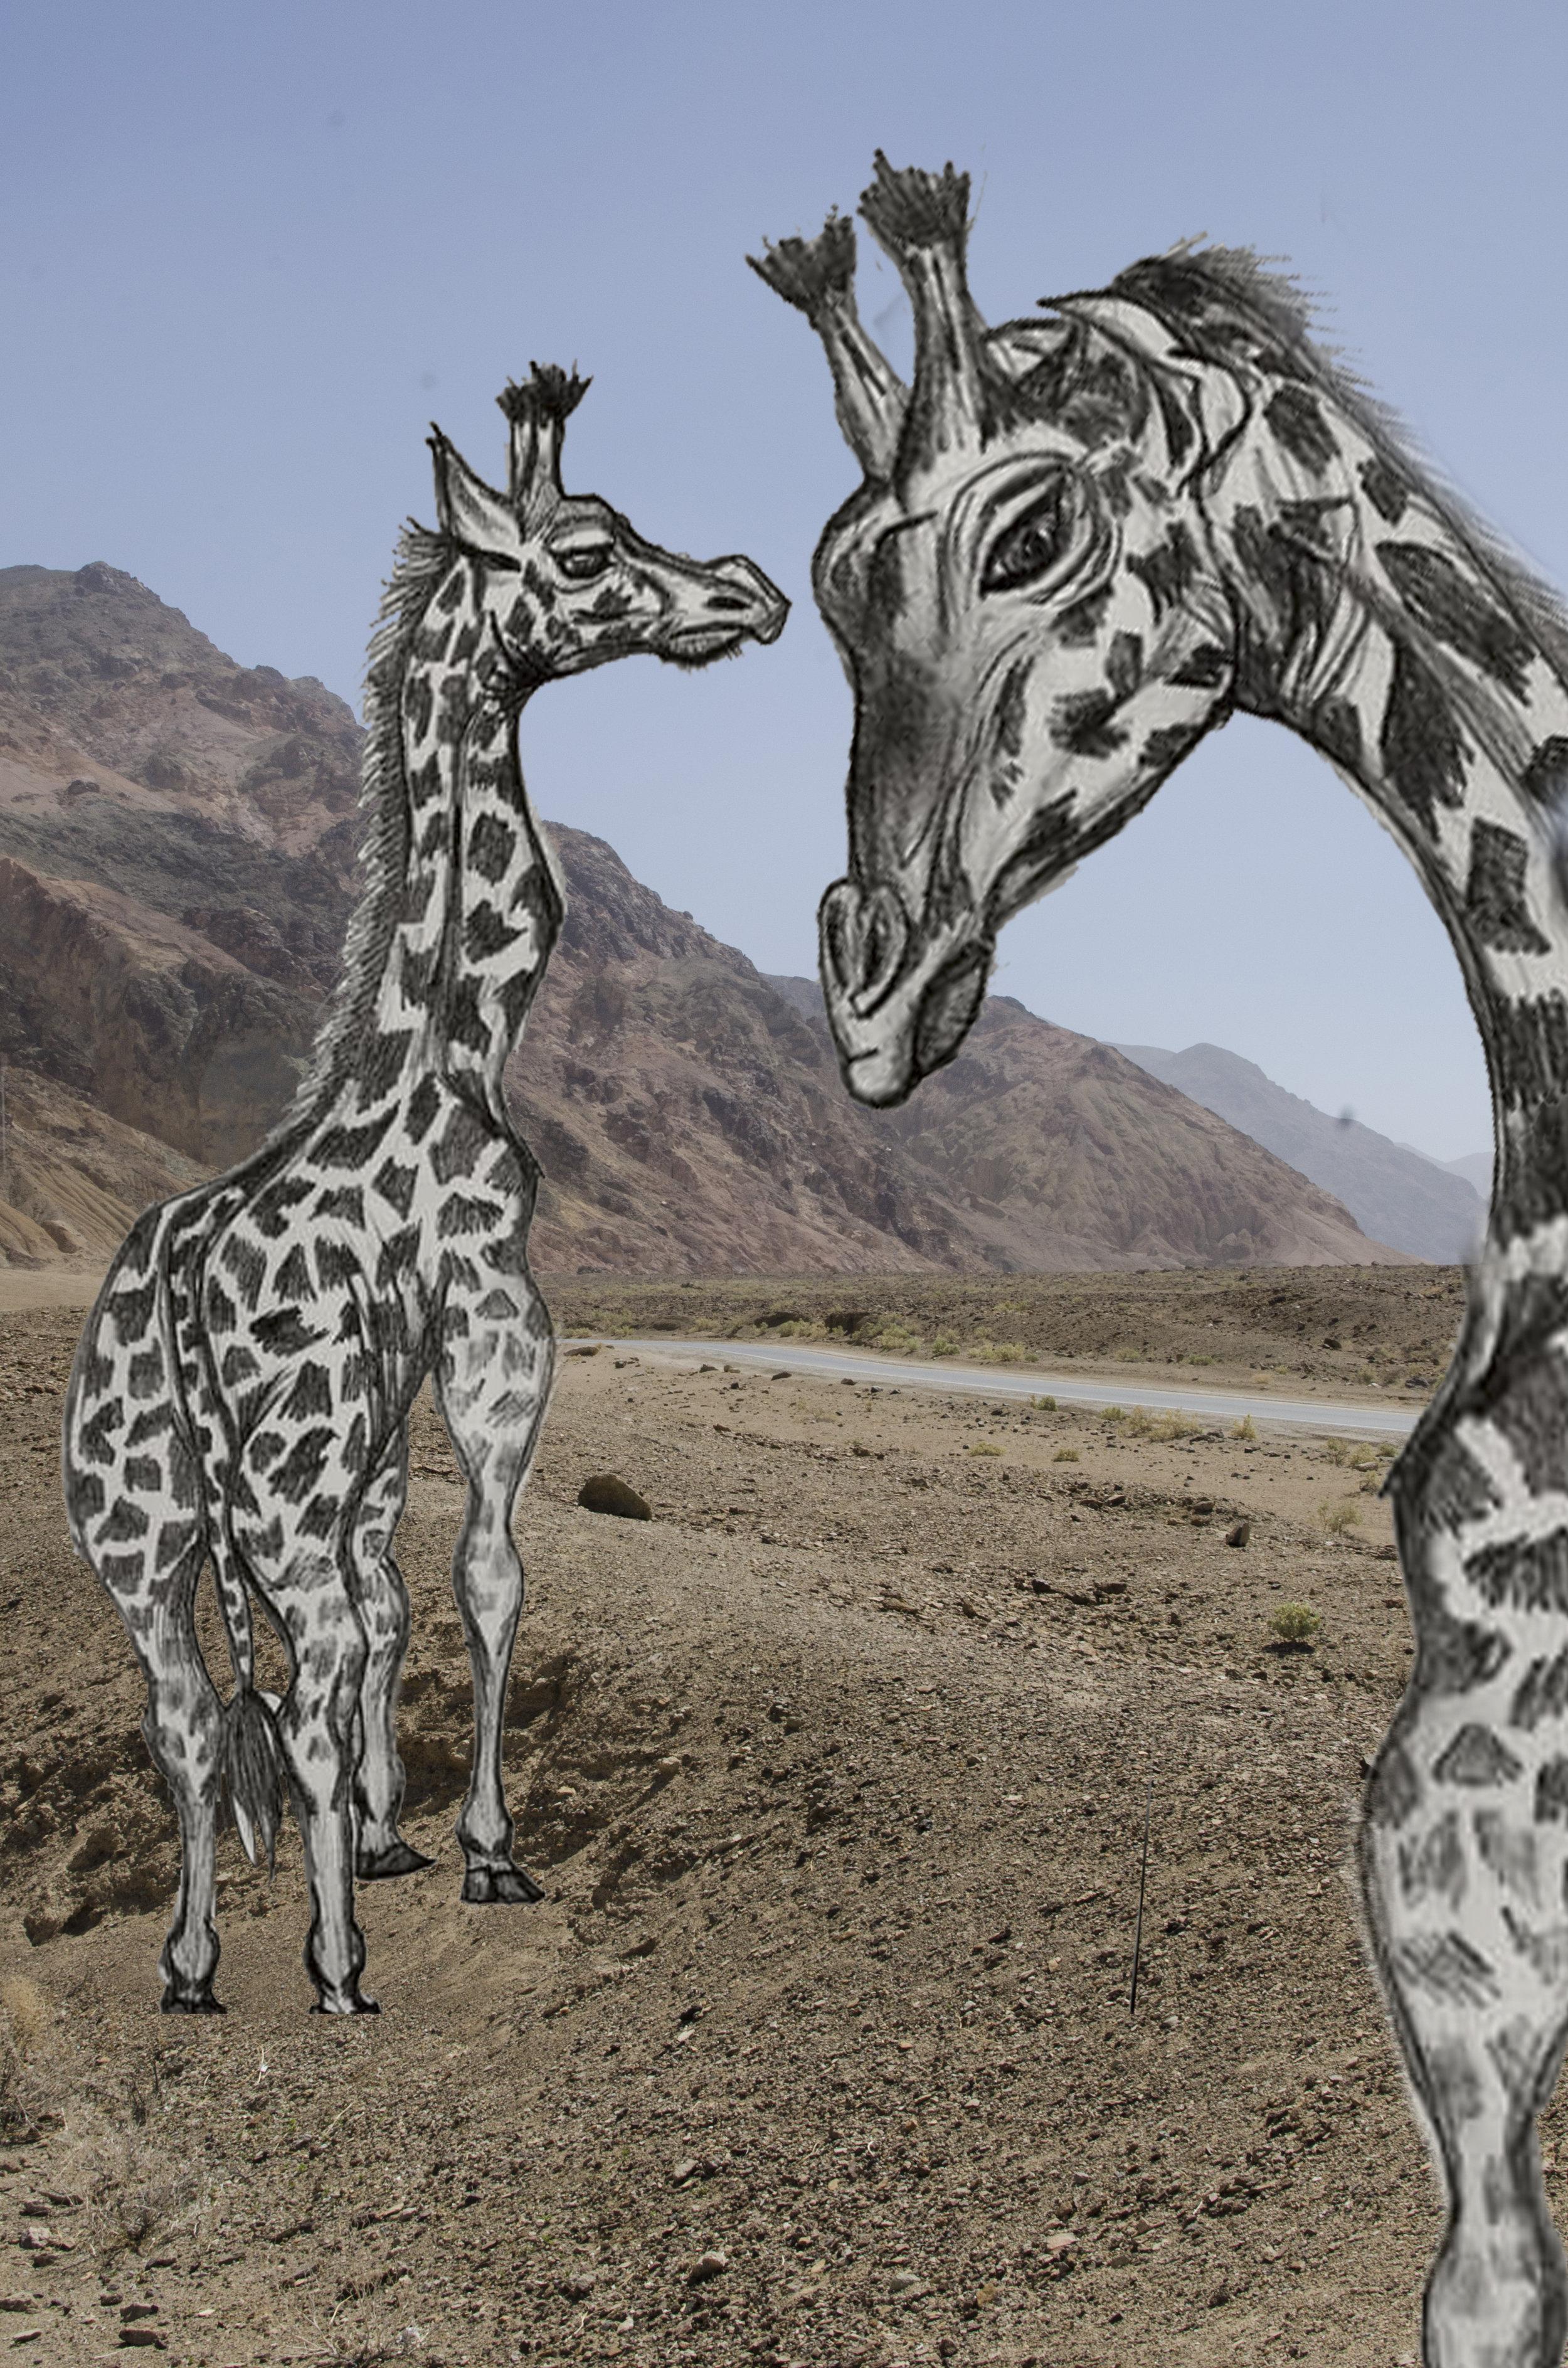 Giraffe Desert    - Mixed Media - 2017